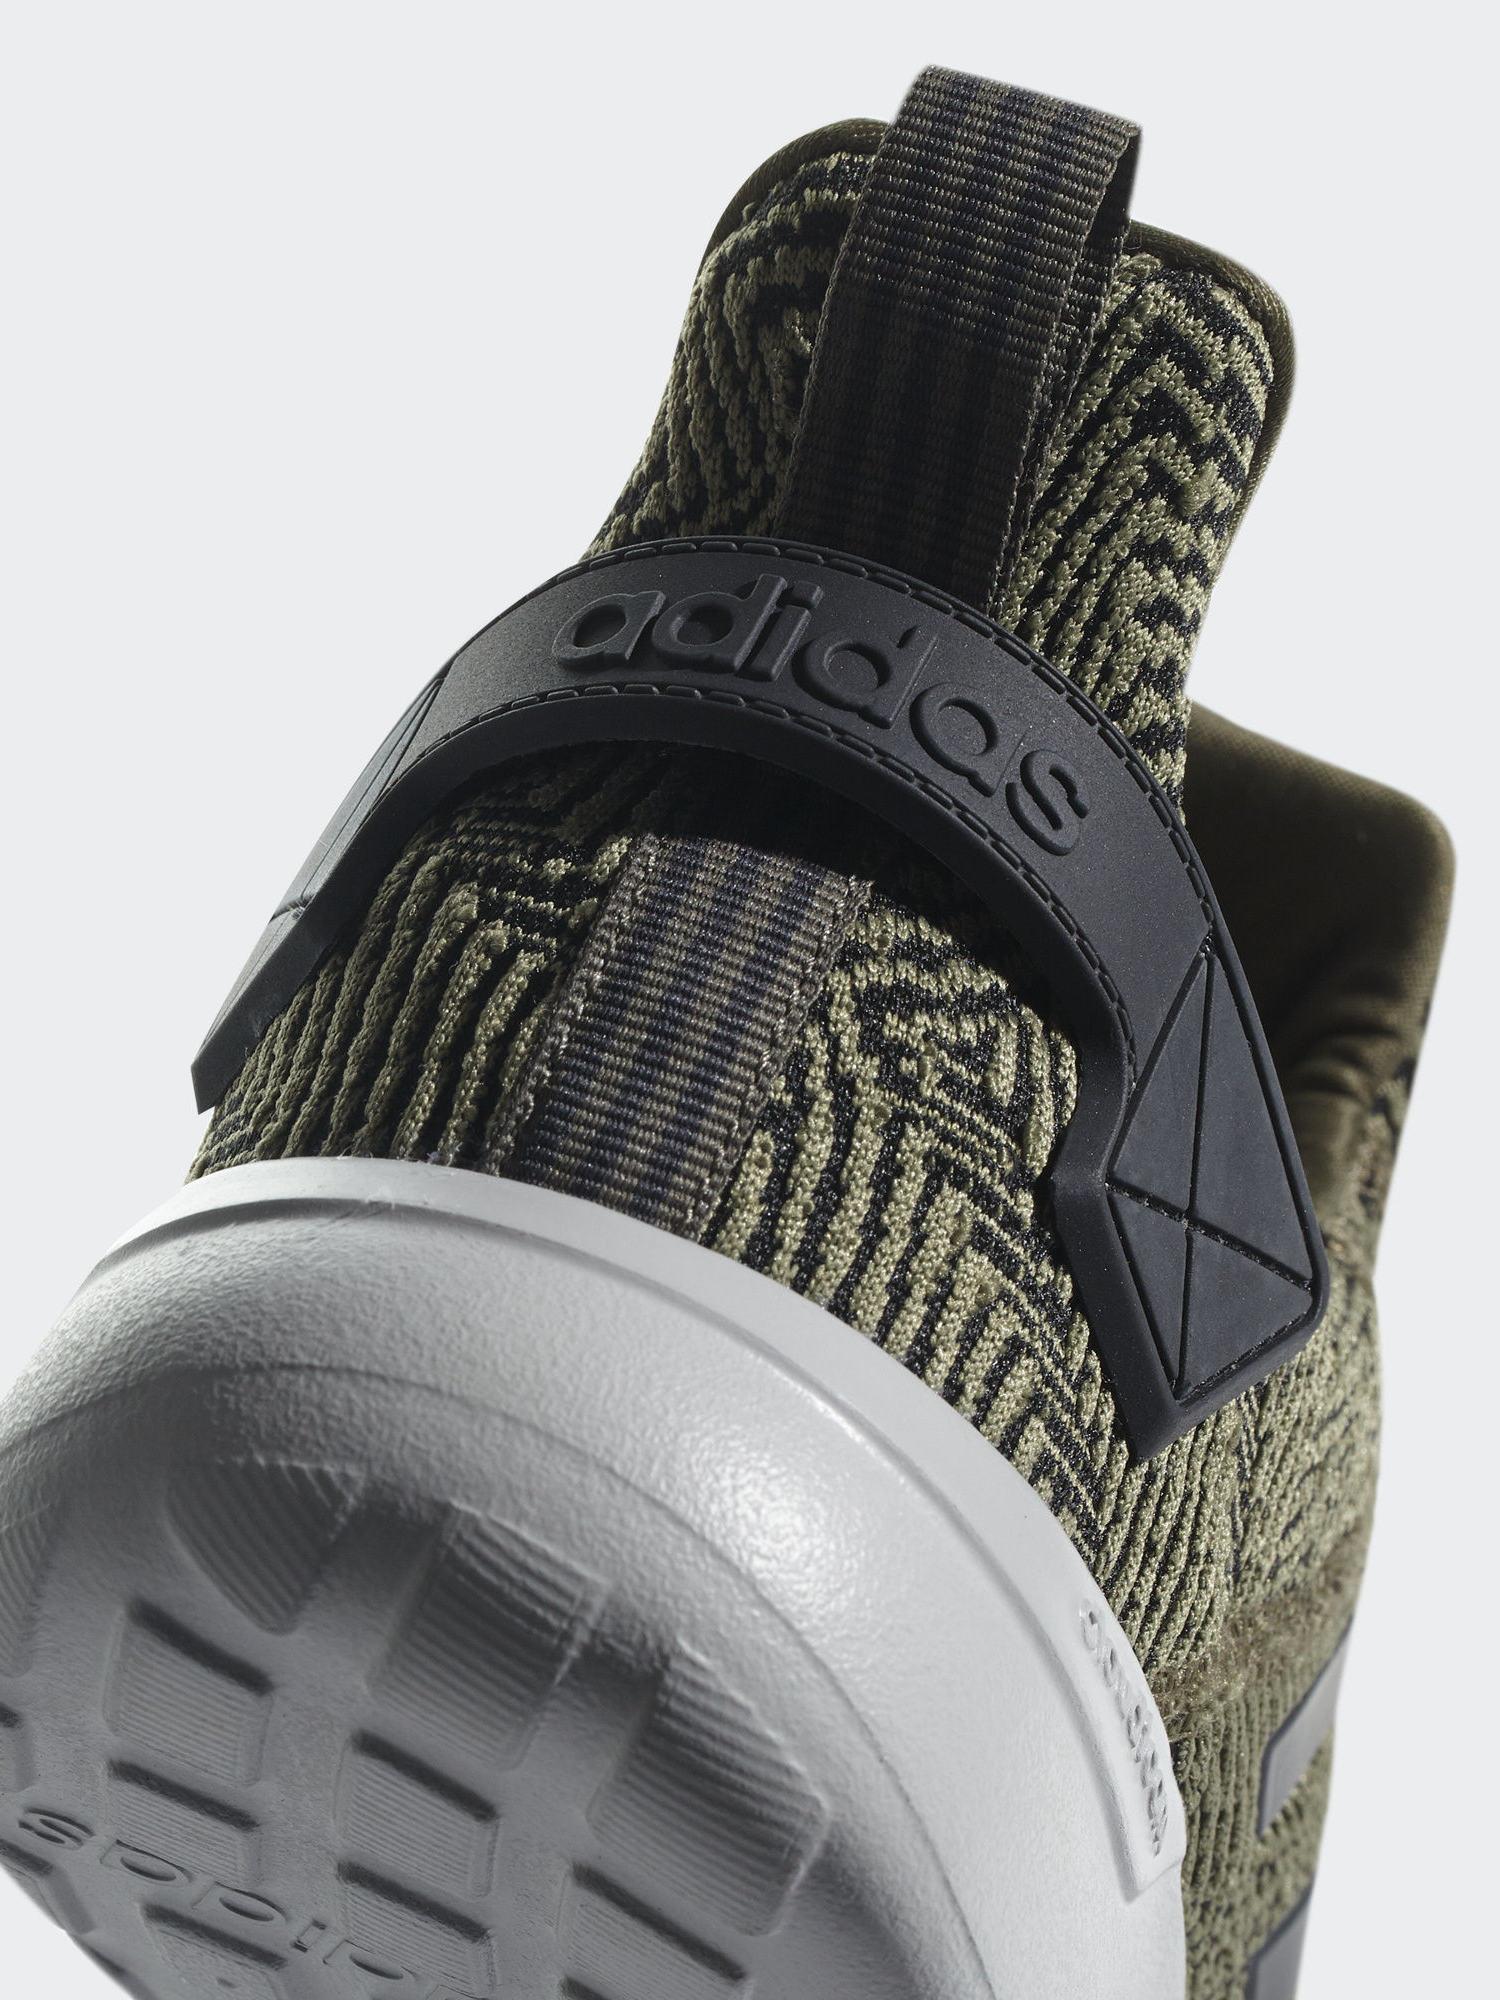 4653ef381f Adidas Scarpe Sneakers Trainers Sportive Ginnastica CF Lite racer Byd Uomo